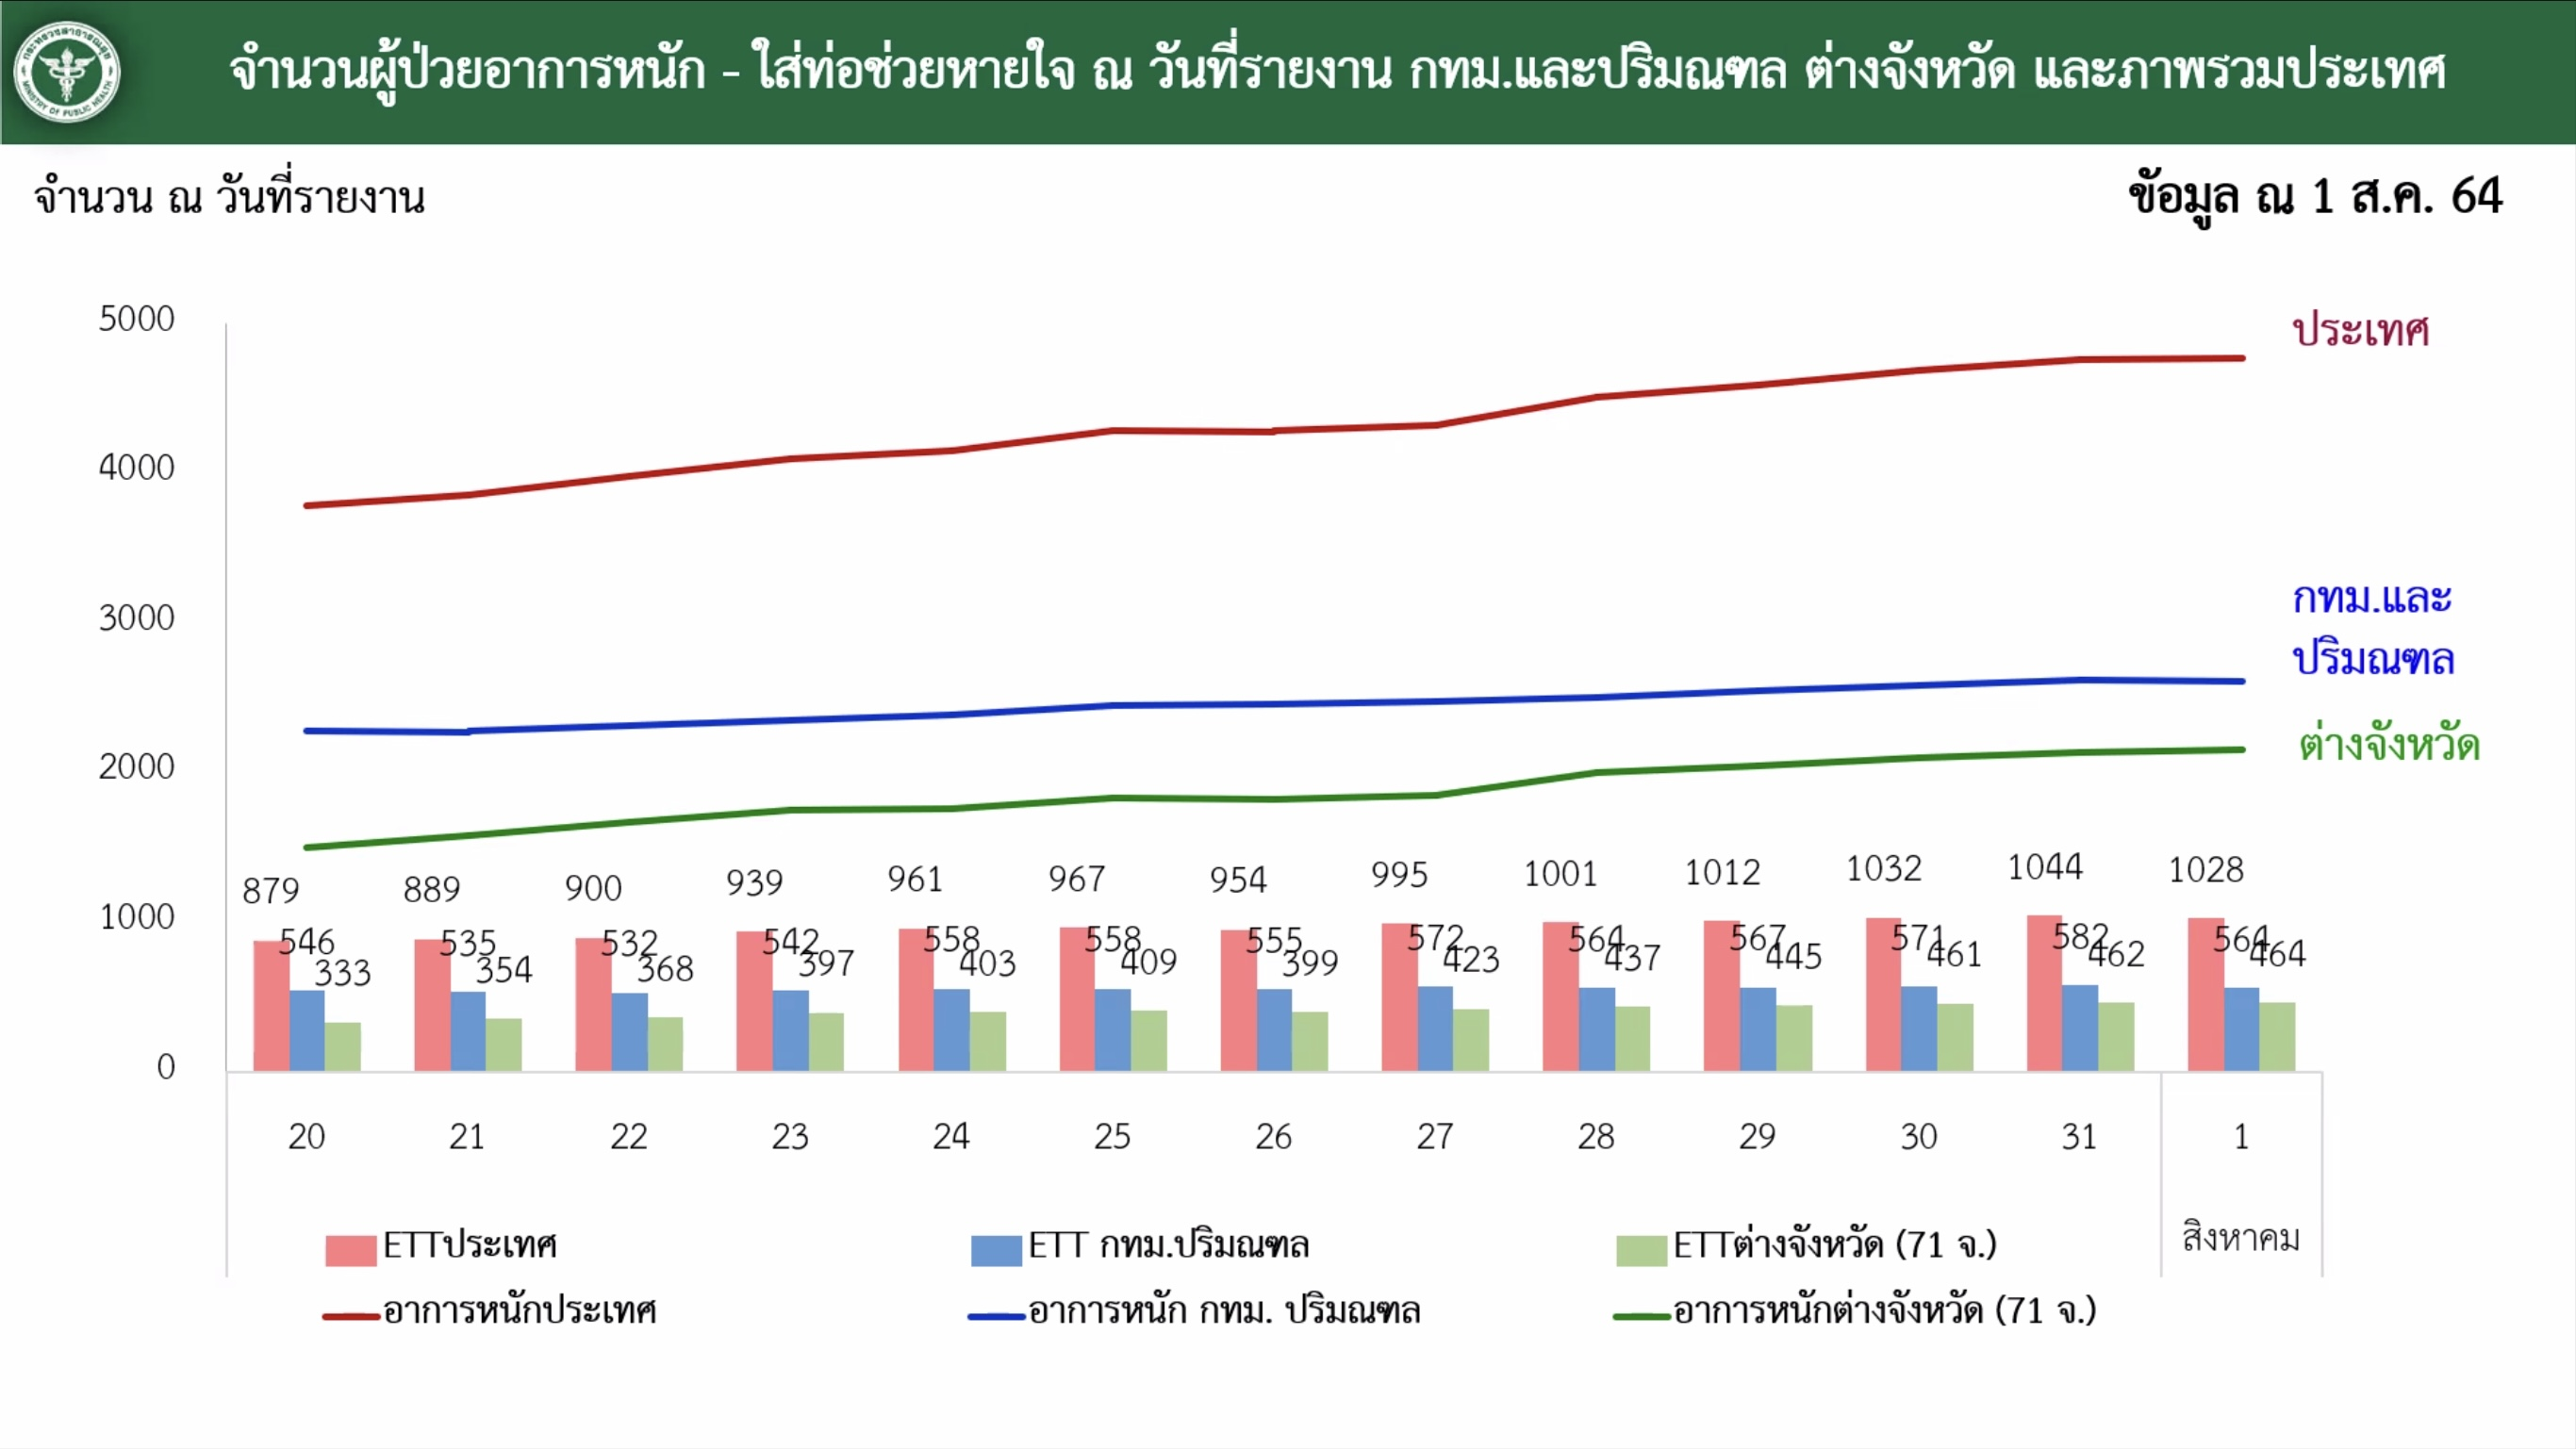 www.thaiguide.dk/images/forum/covid19/kritisk%20syge%20graf%20CCSA%2002-08-21.jpeg